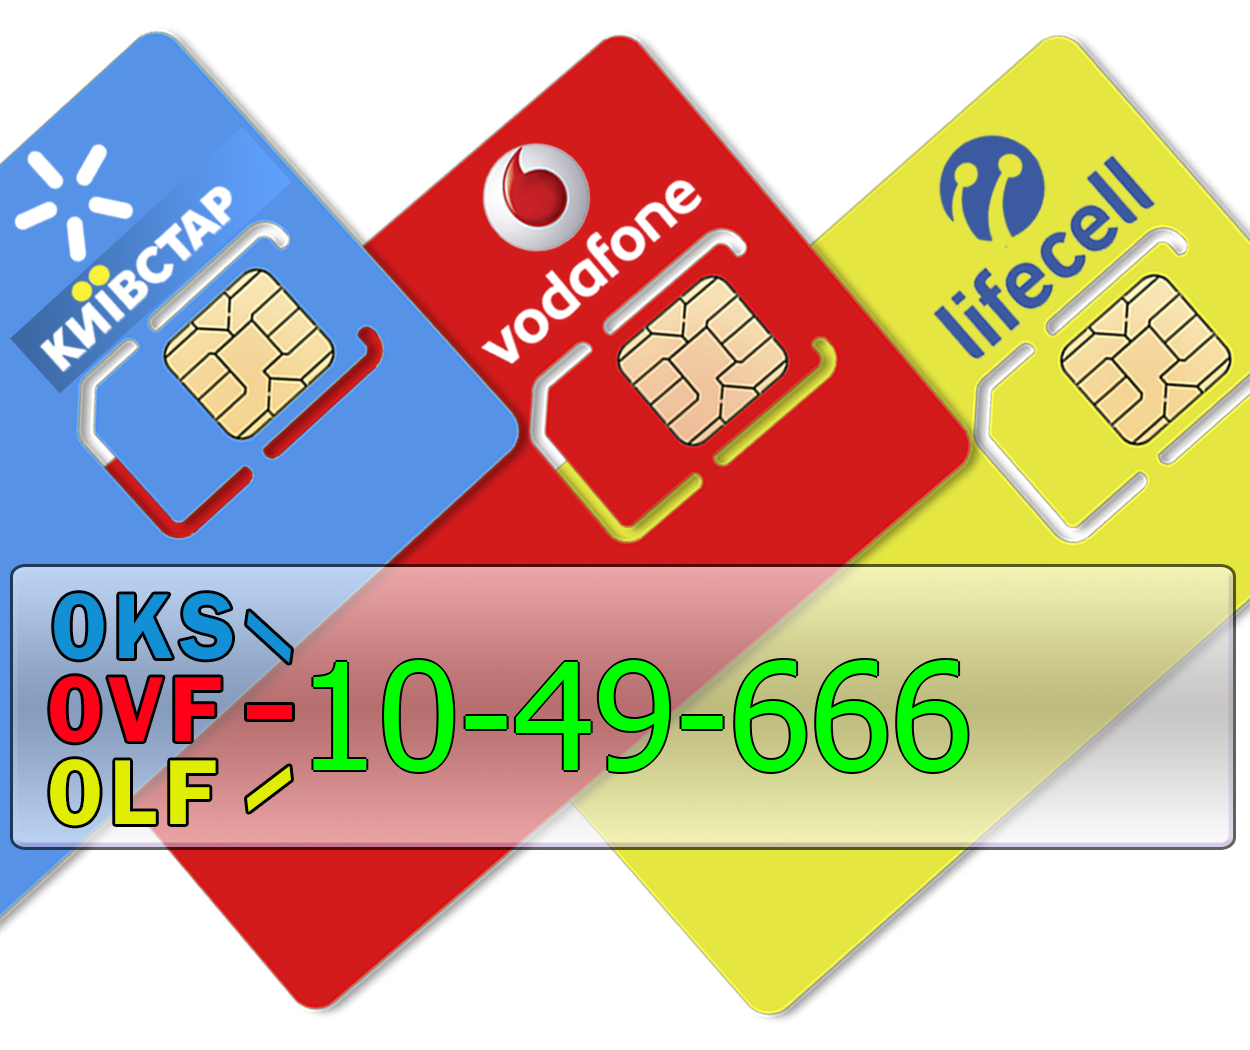 Трио 0KS-10-49-666 0LF-10-49-666 0VF-10-49-666 Киевстар, lifecell, Vodafone